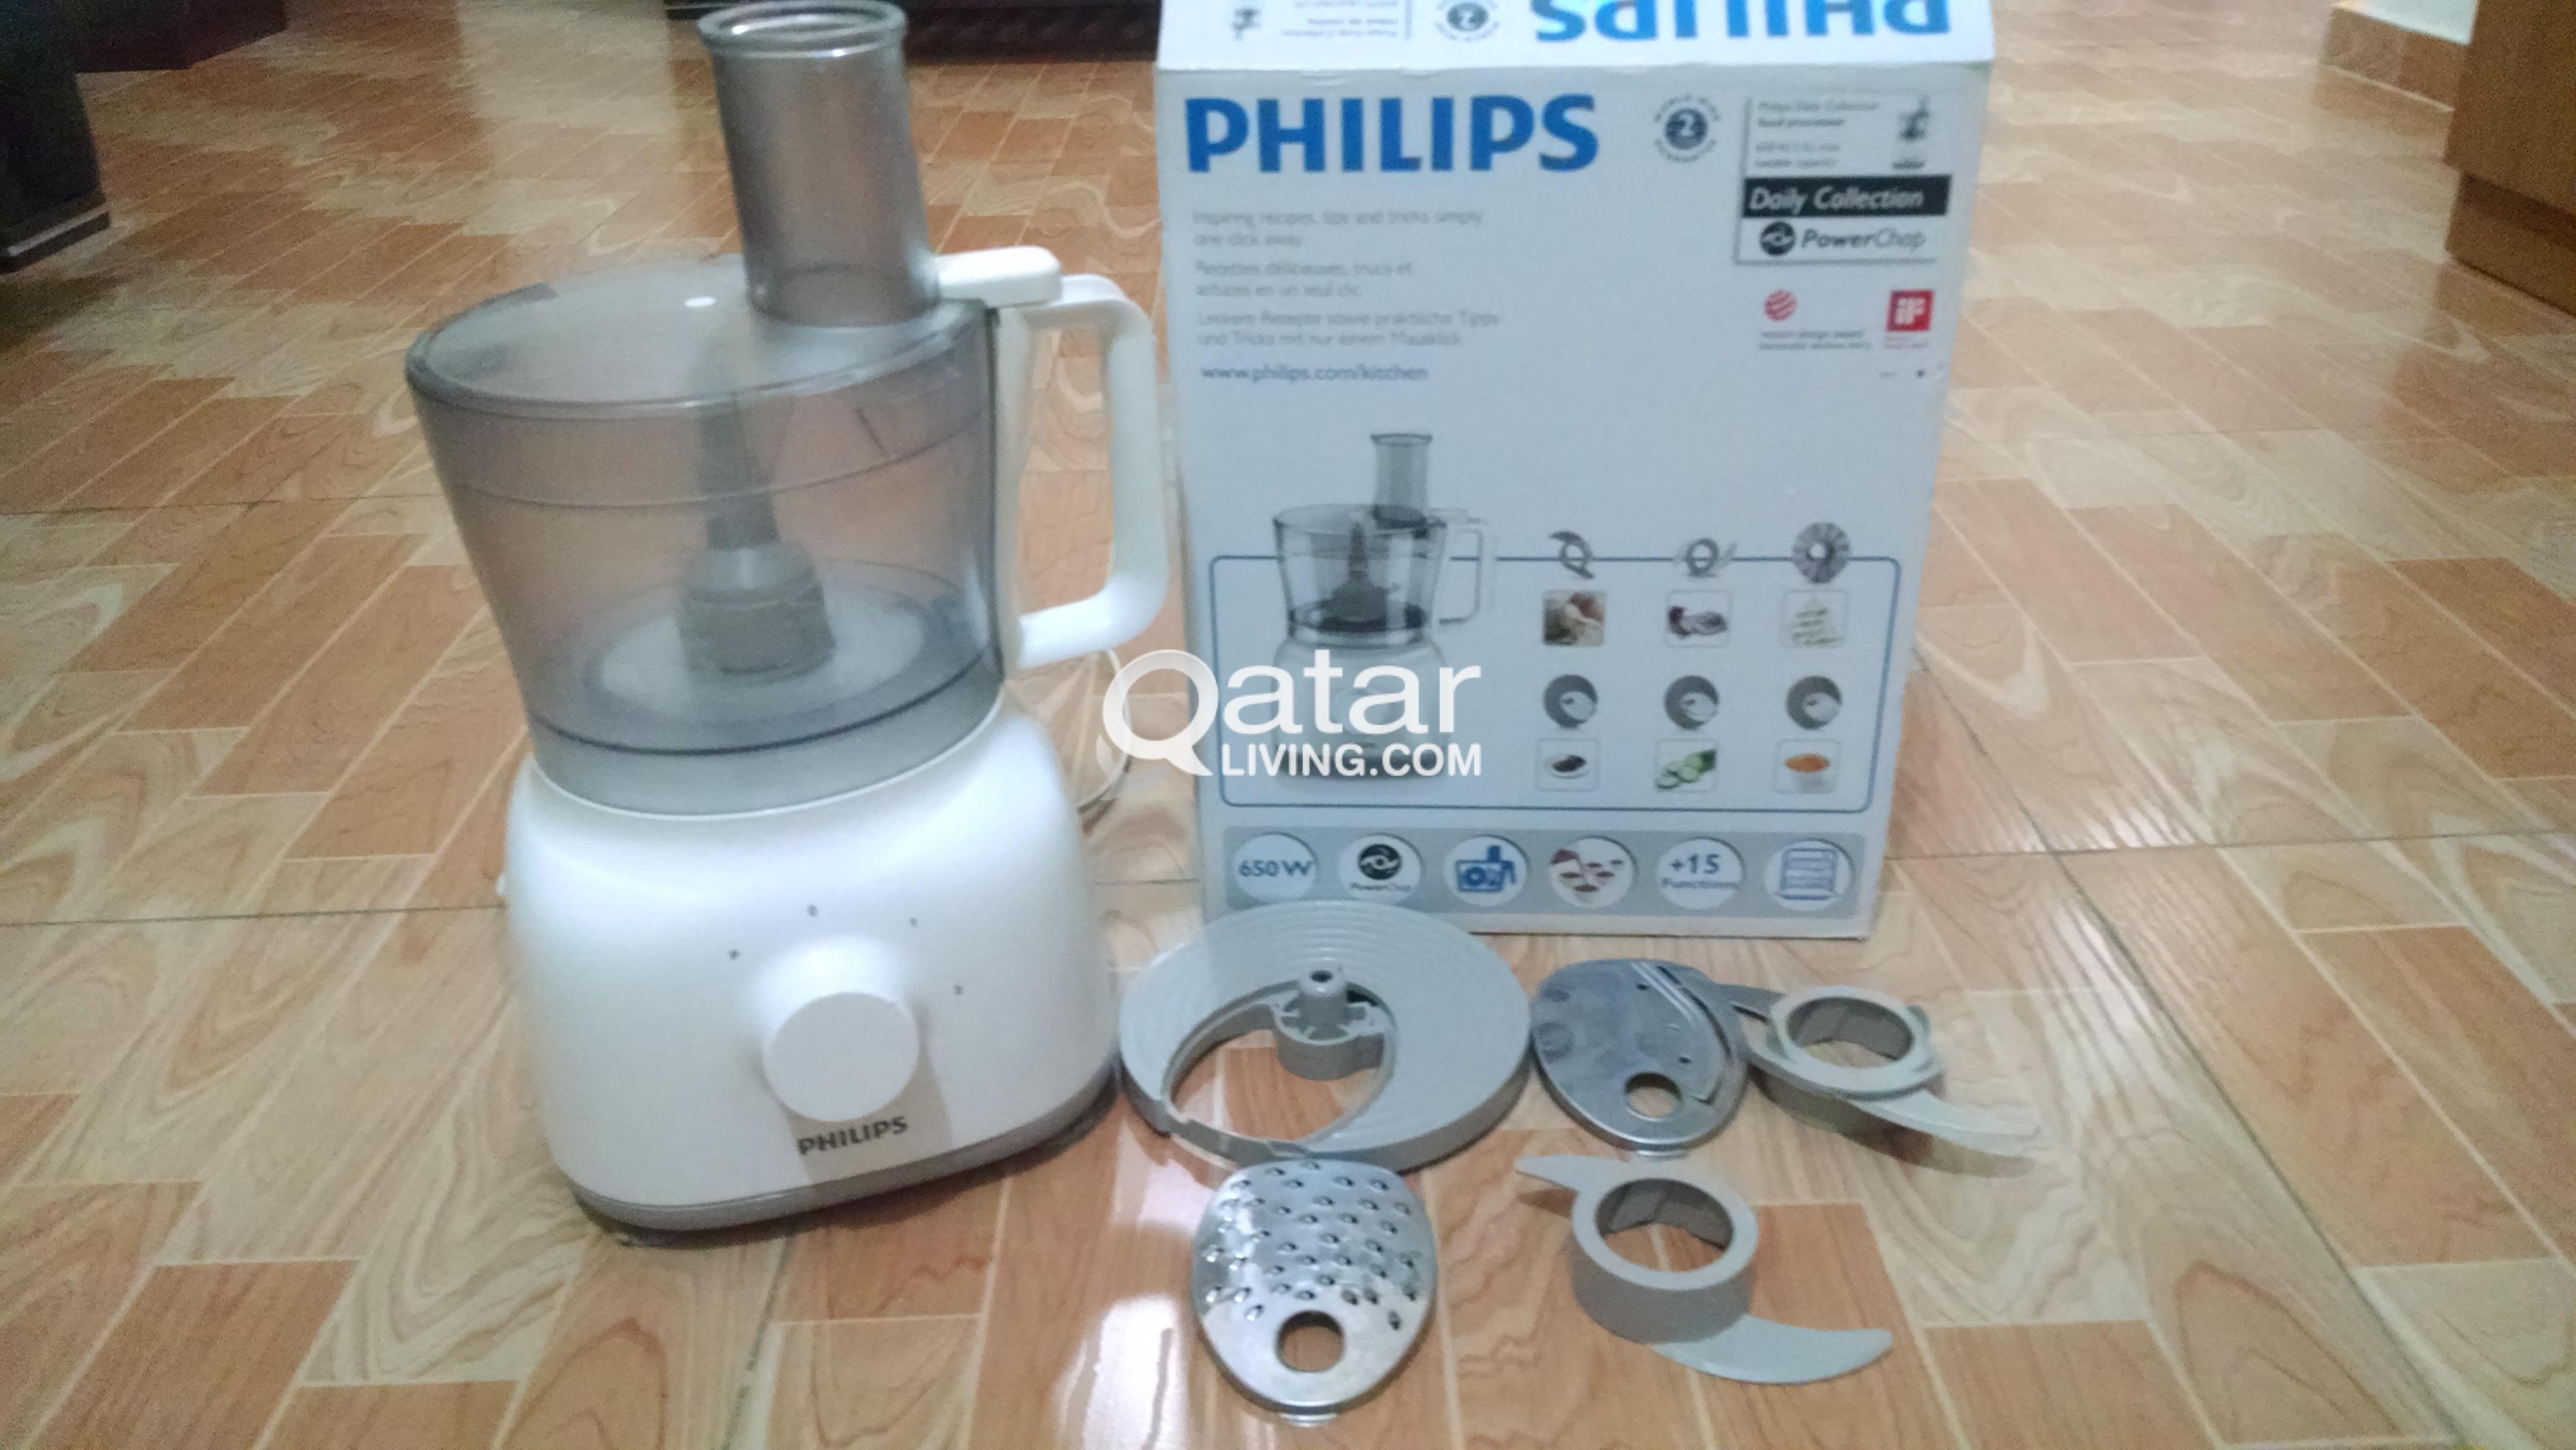 Philips food processor for sale   Qatar Living